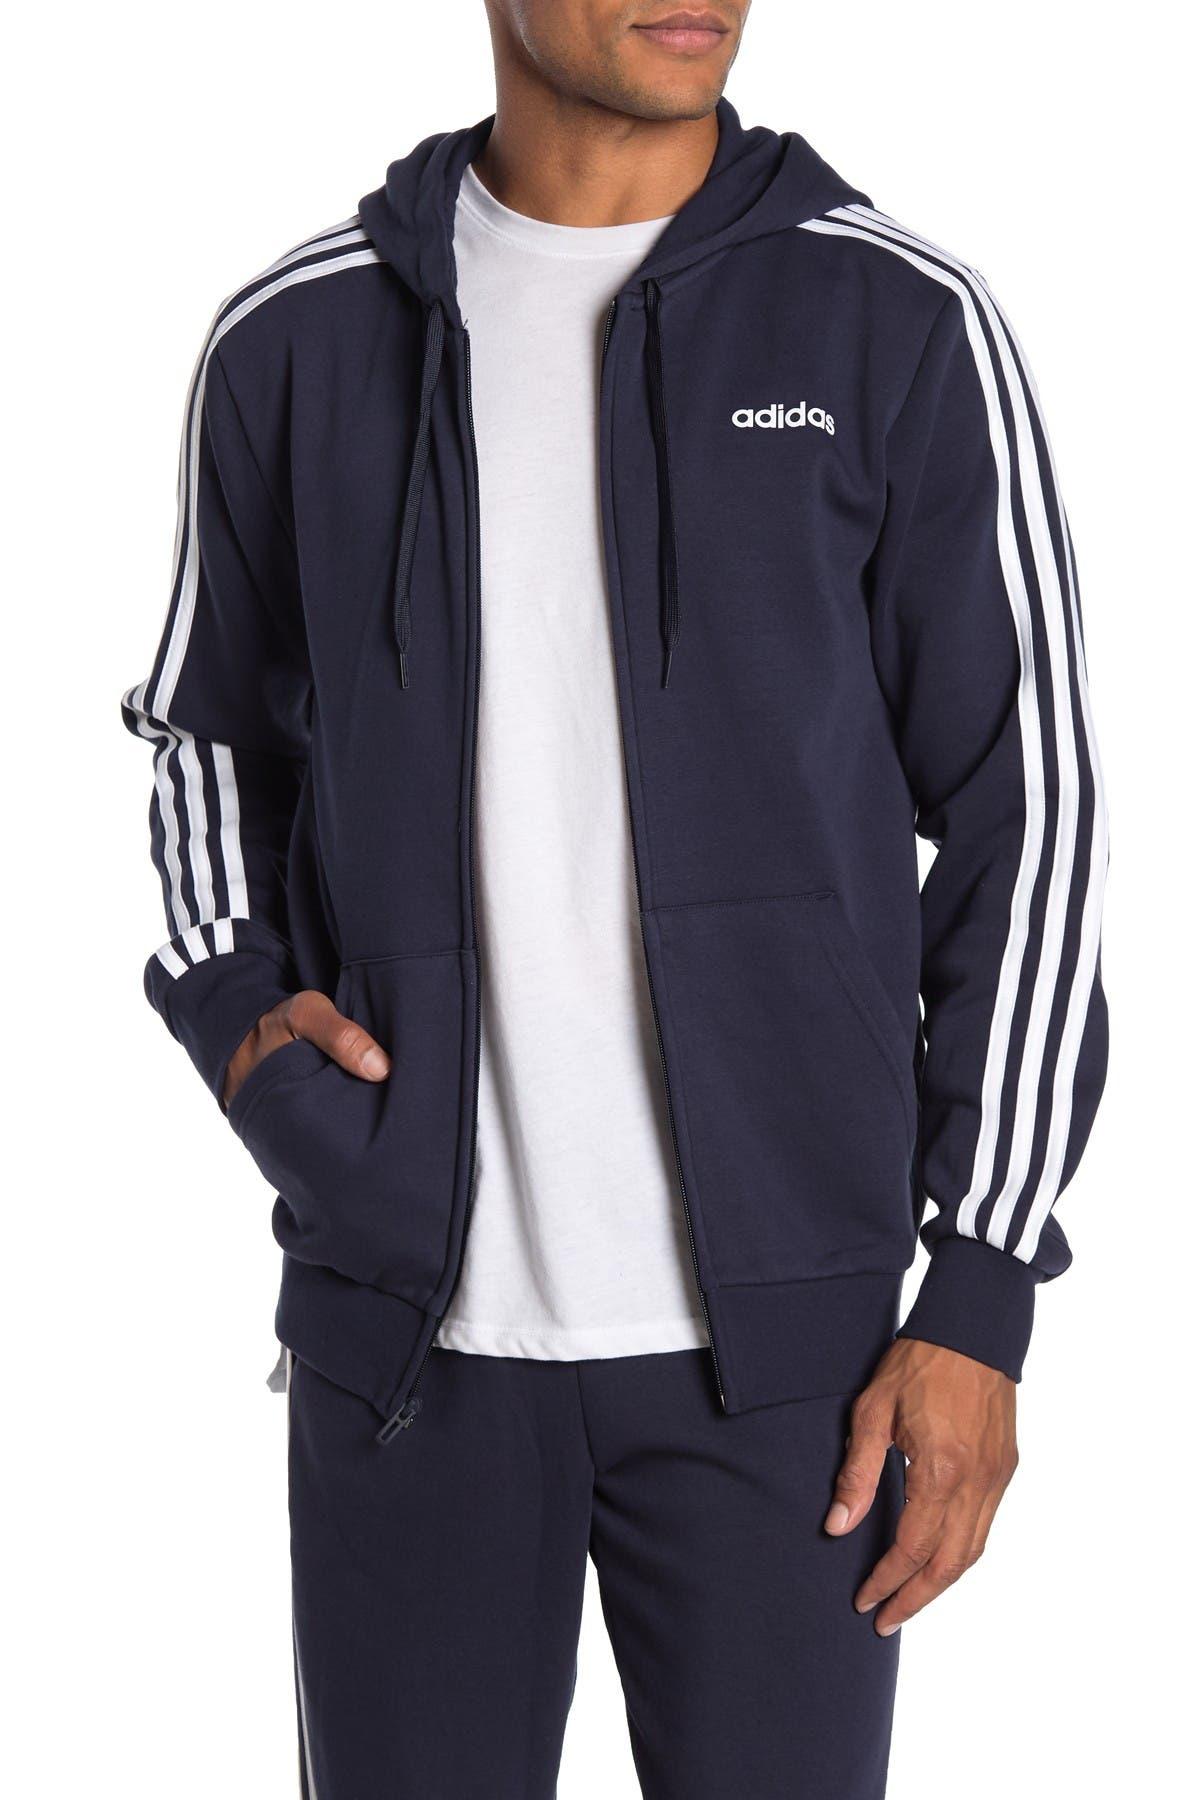 Image of adidas Essentials 3-Stripe Zip-Up Hoodie